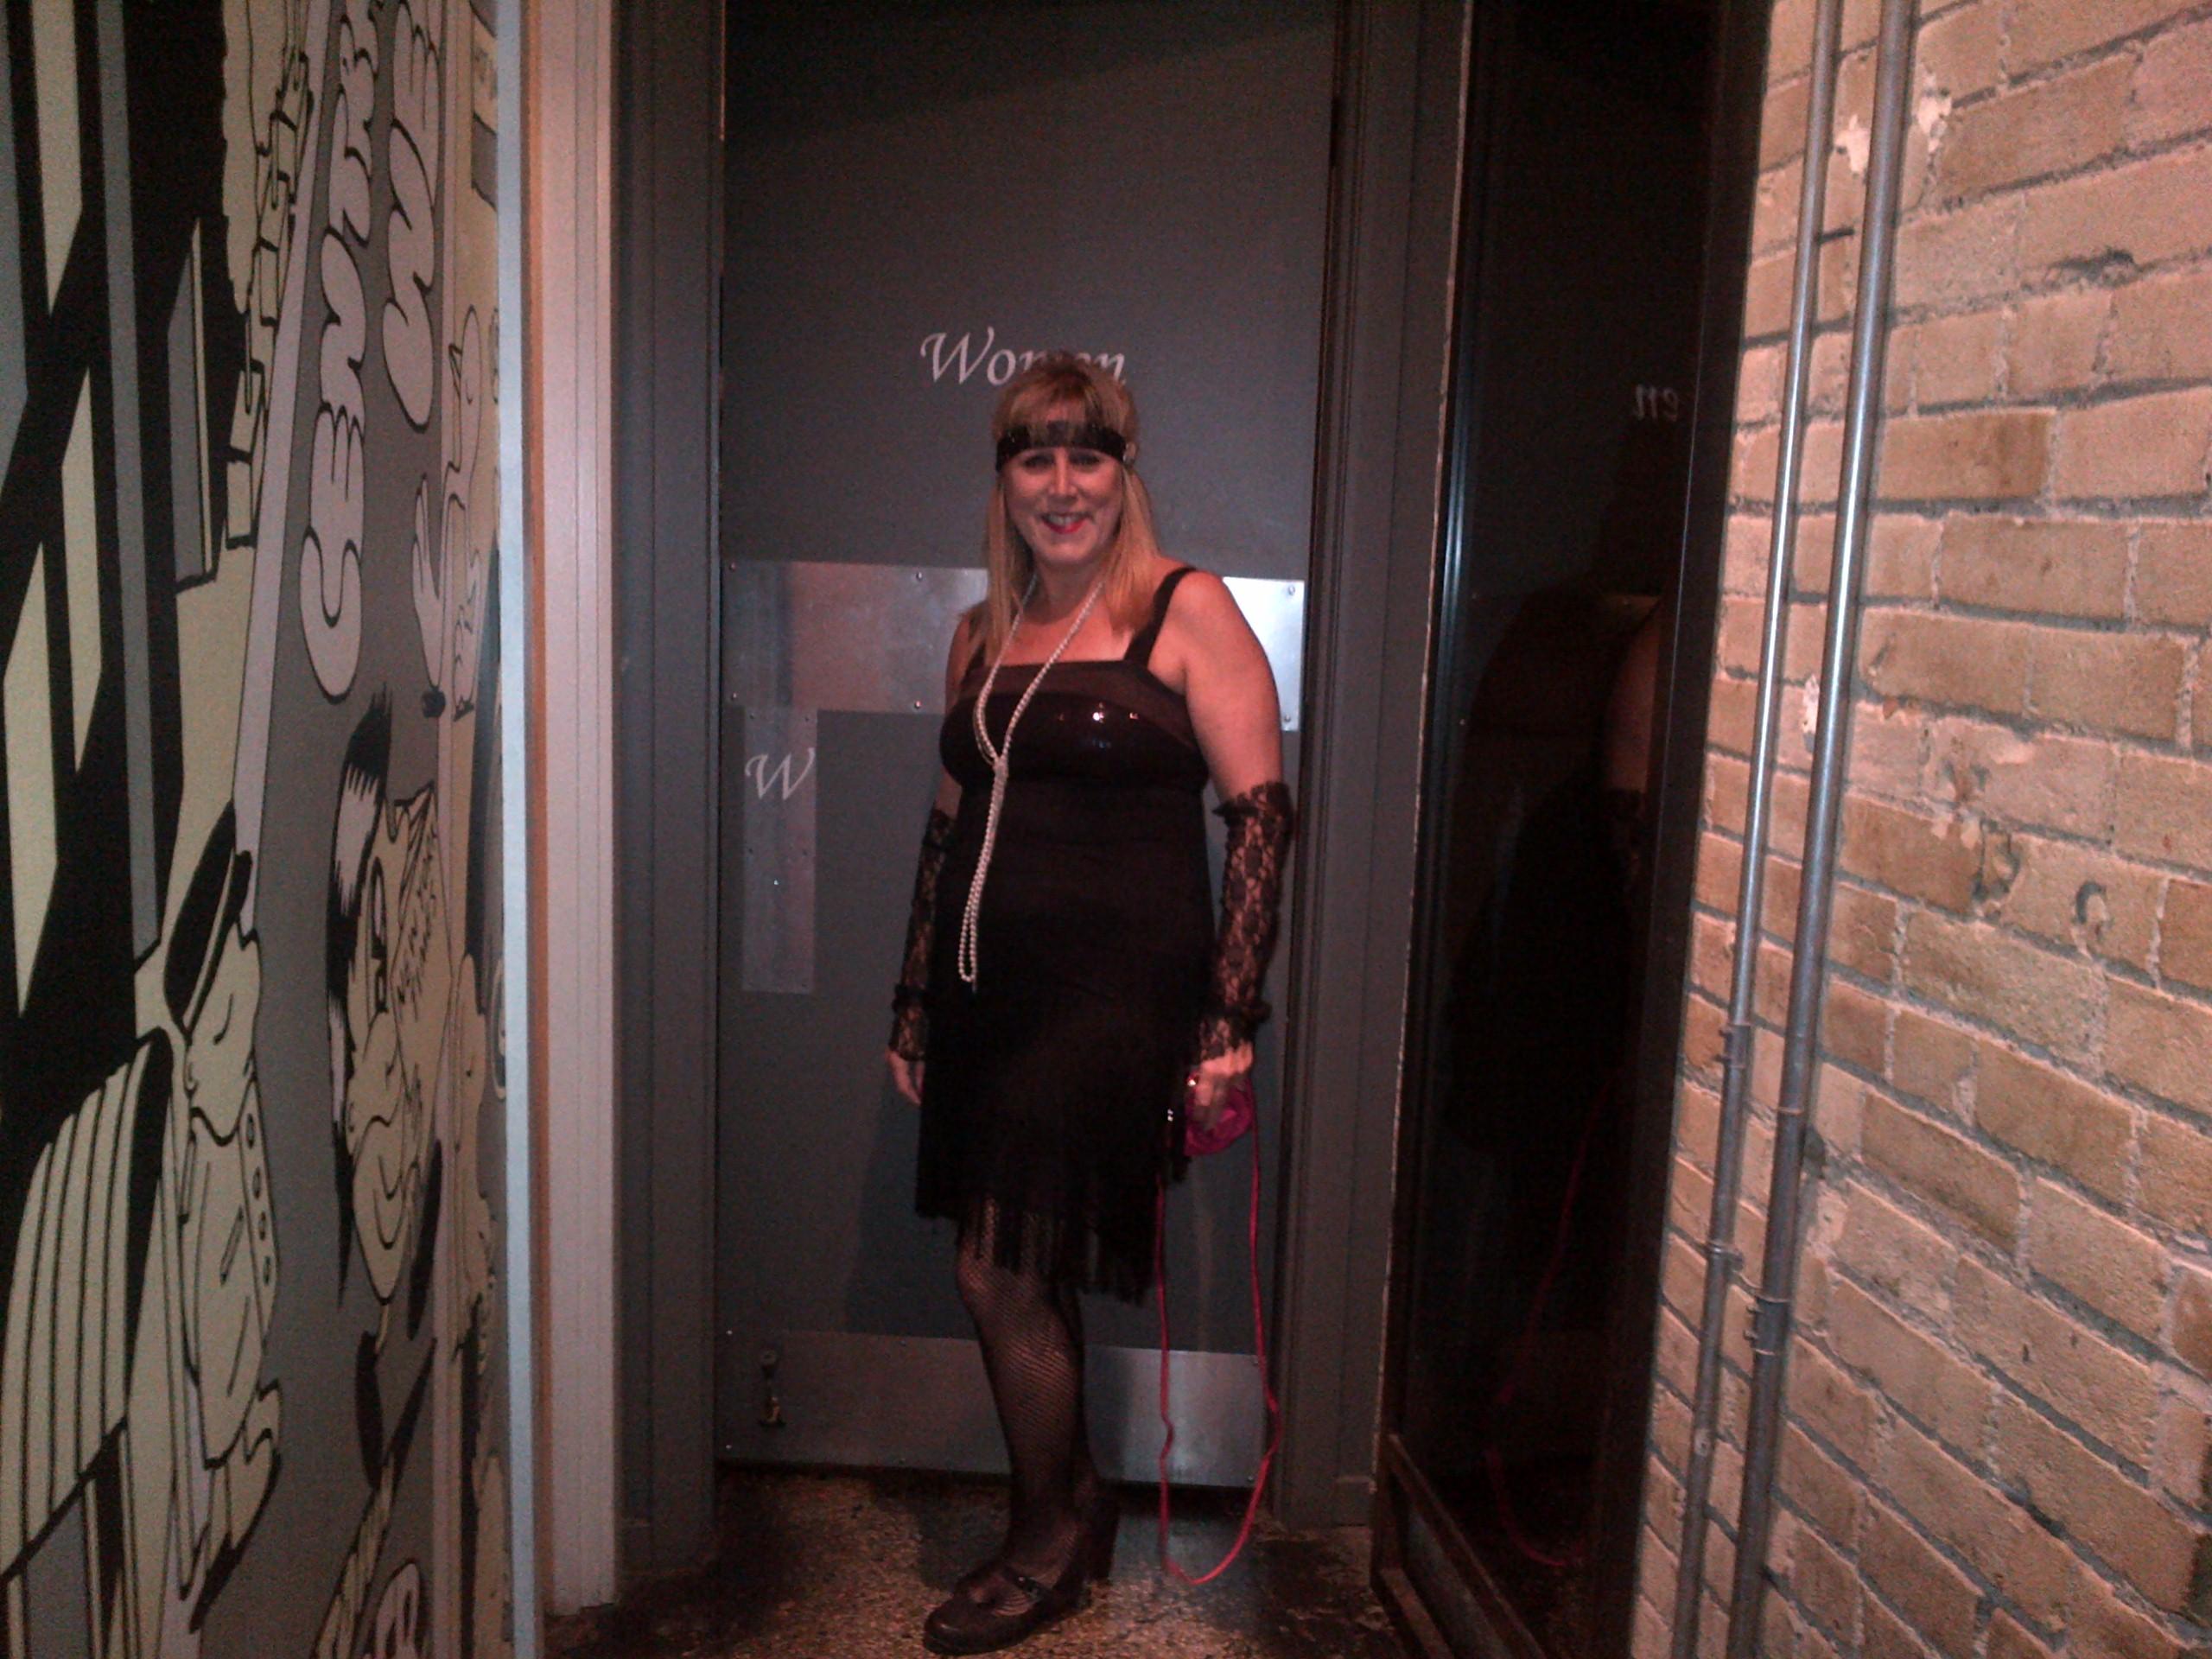 Seneca College English professor Rona Kaushansky in a flapper dress